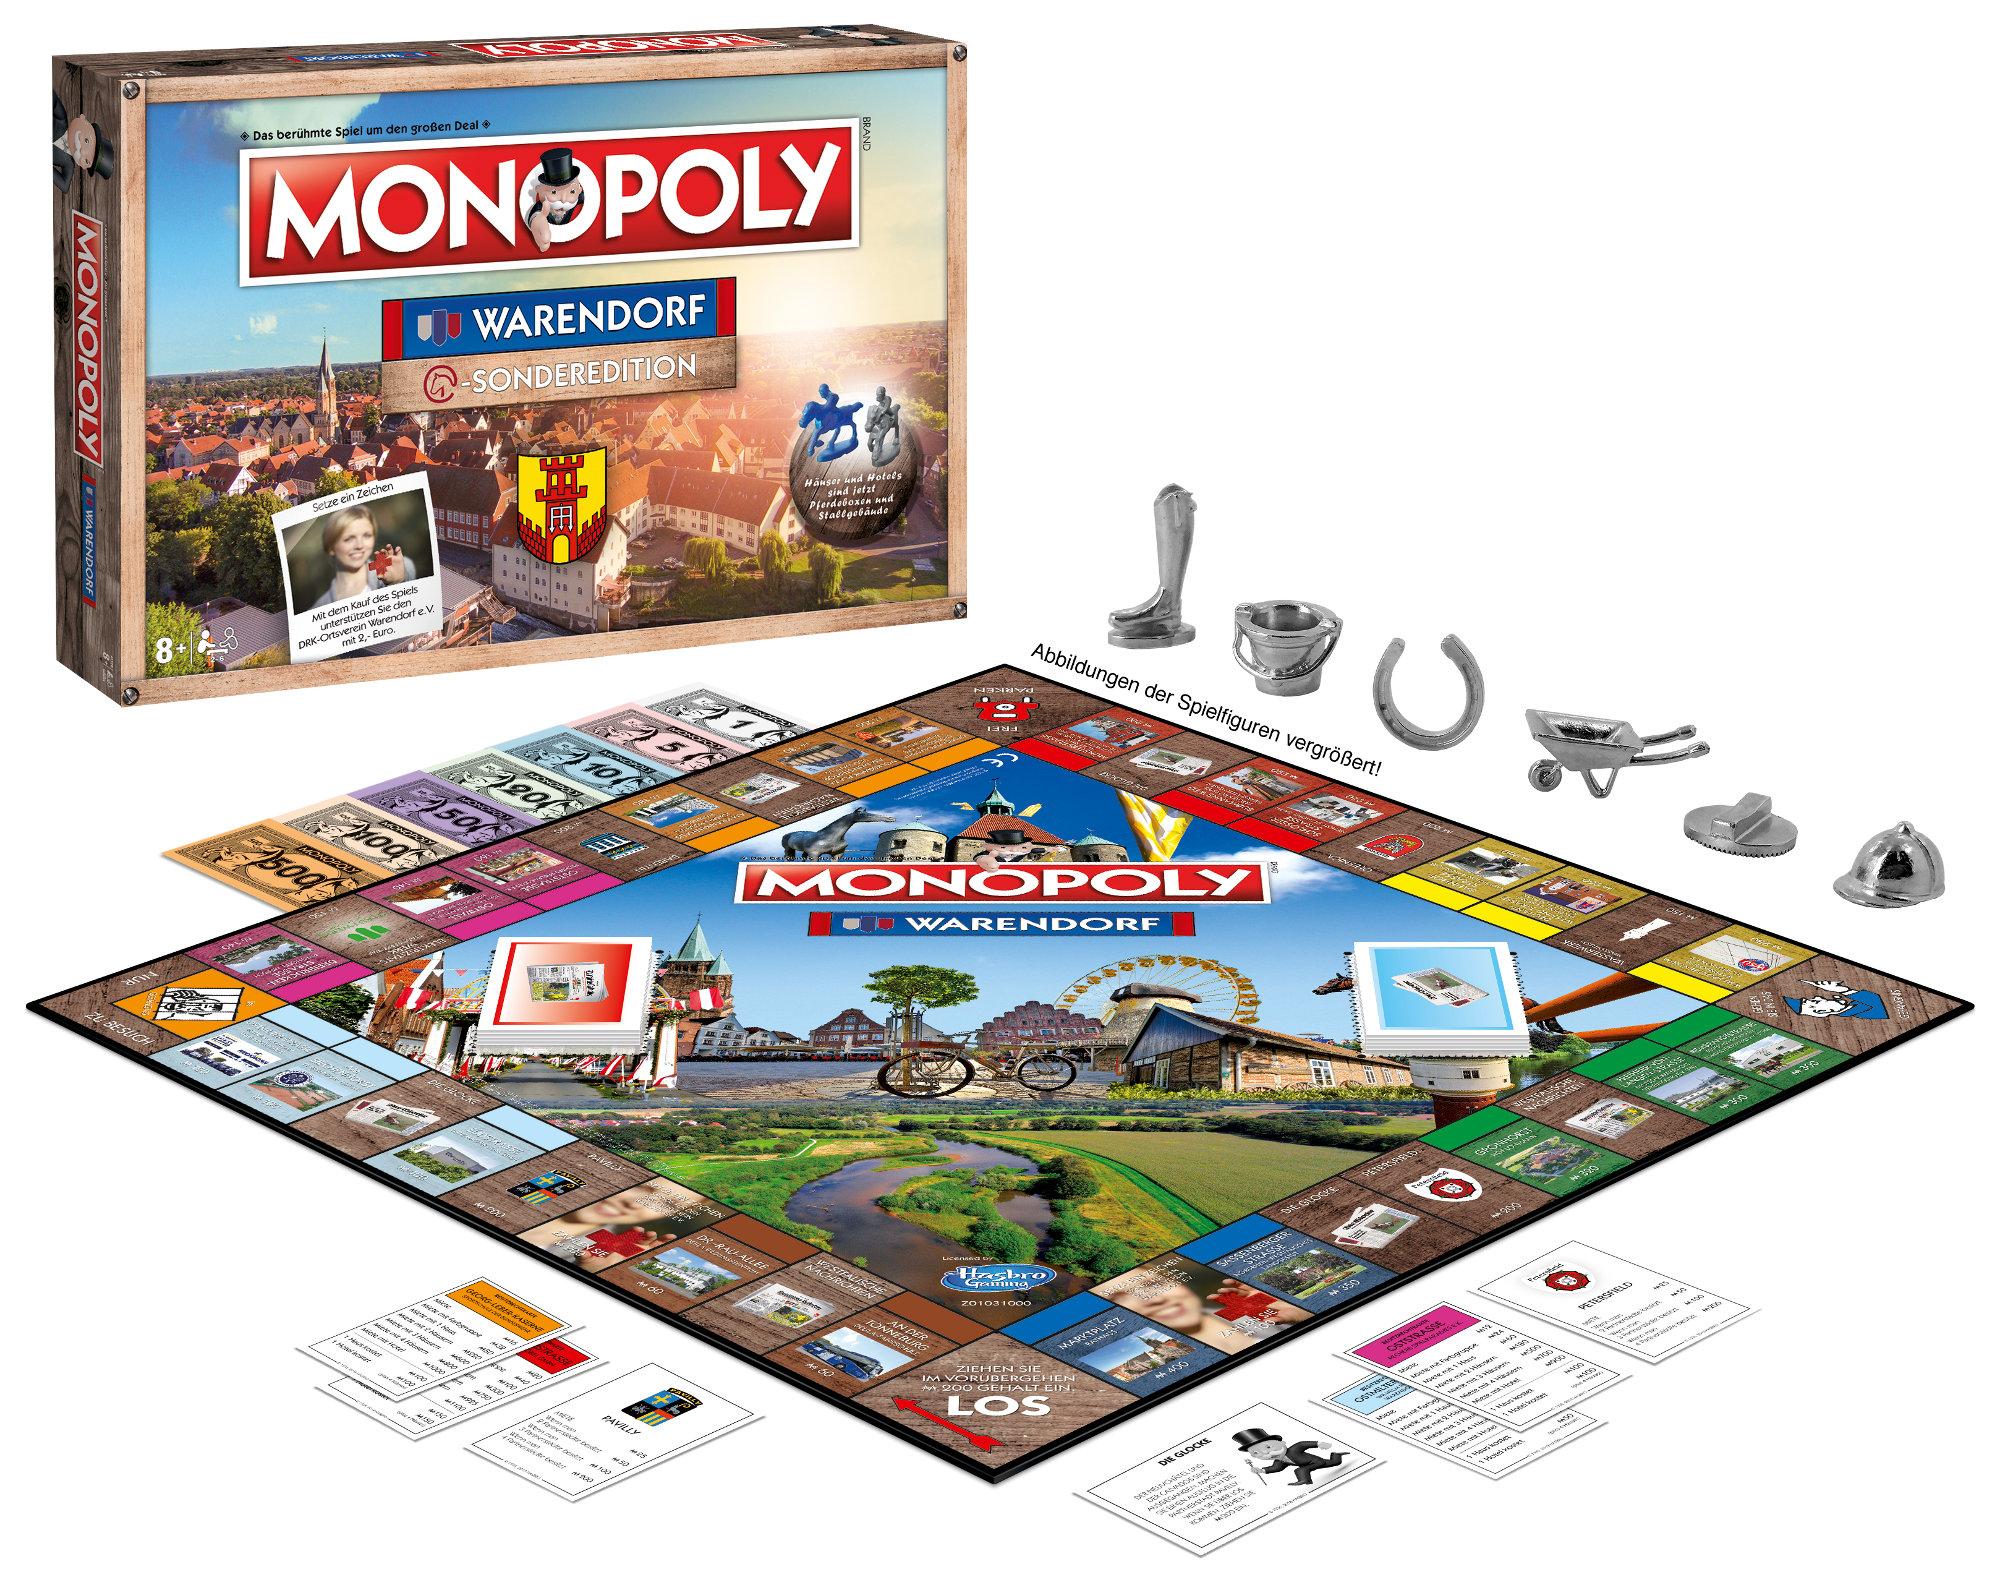 Monopoly Warendorf Sonderedition